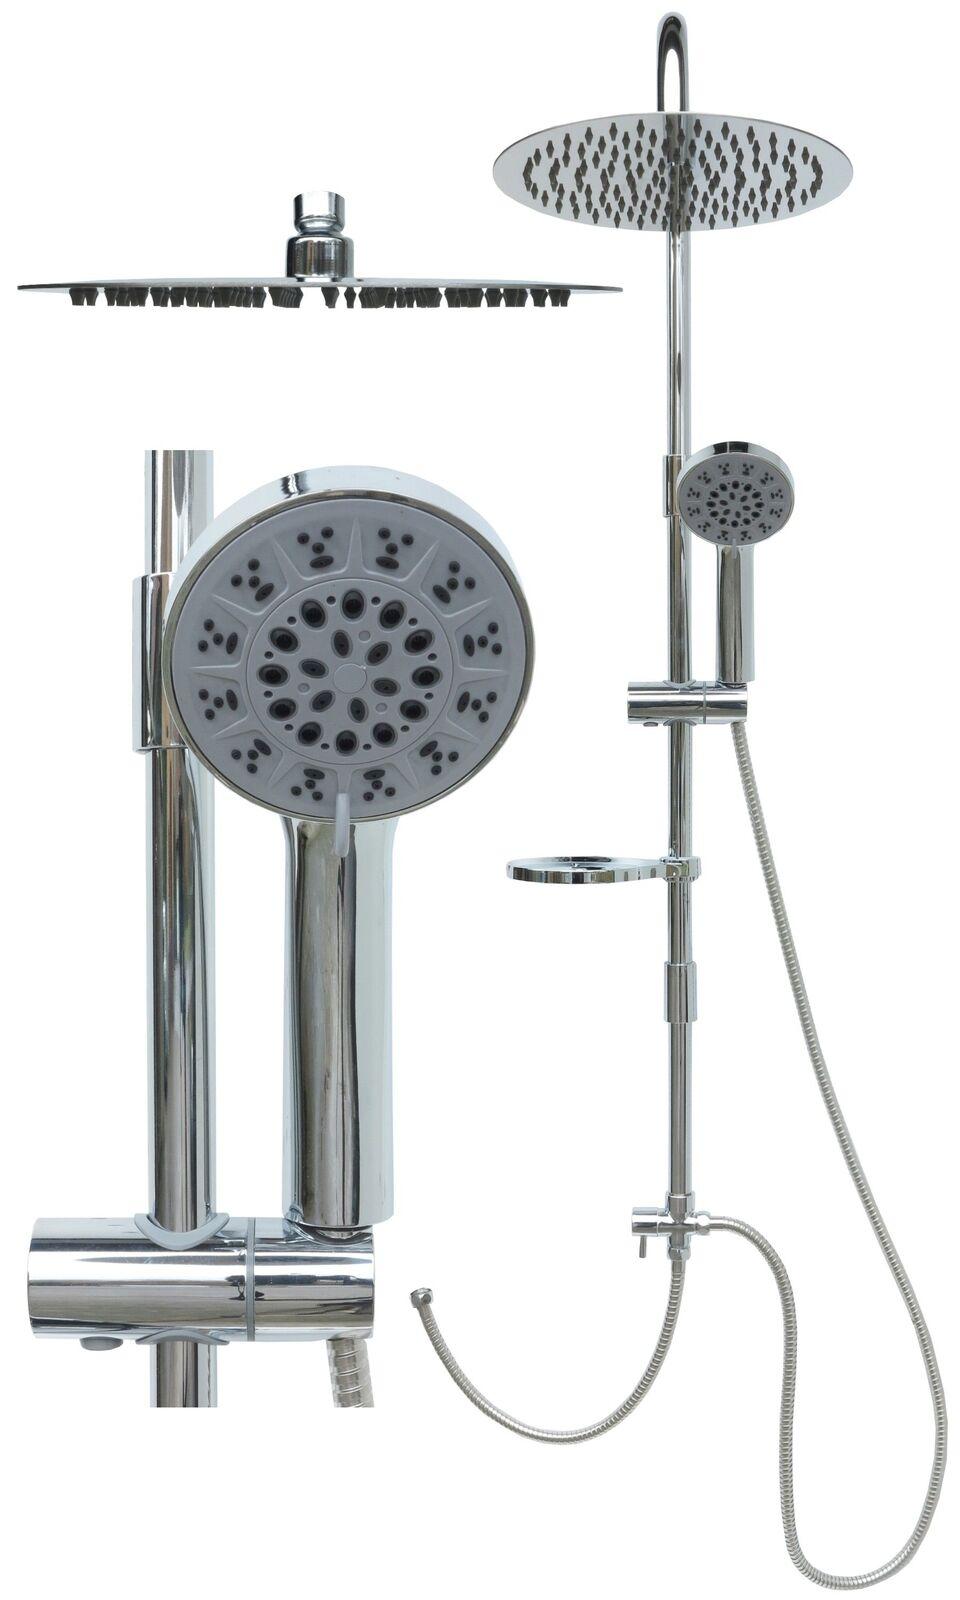 Duschset Duschsystem Edelstahl Duschstange Duscharmatur Regendusche Brause Chrom